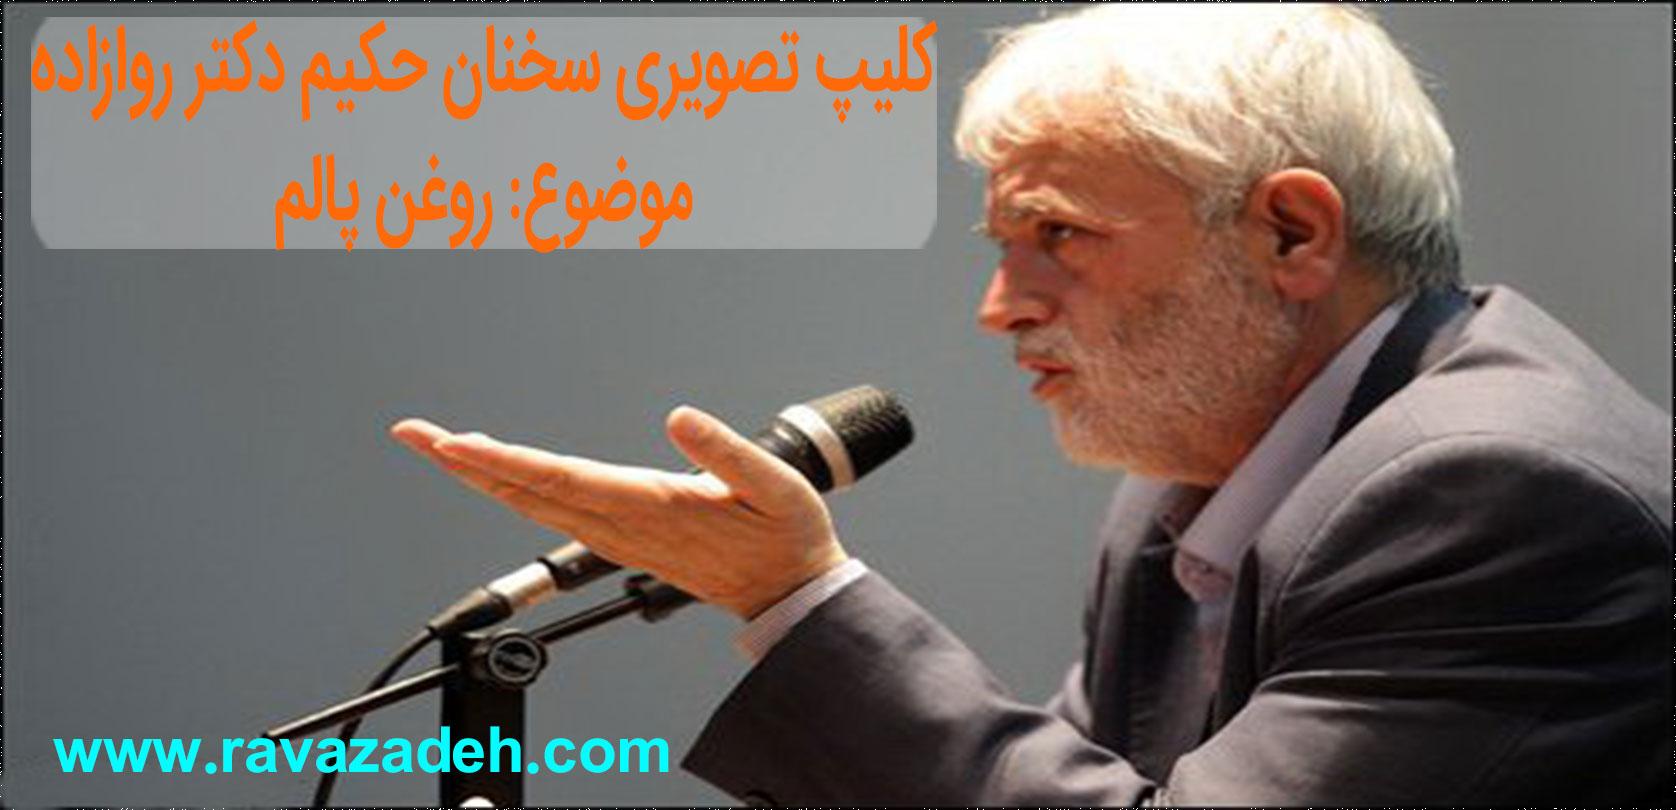 Photo of روغن پالم + کلیپ تصویری سخنرانی حکیم دکتر روازاده